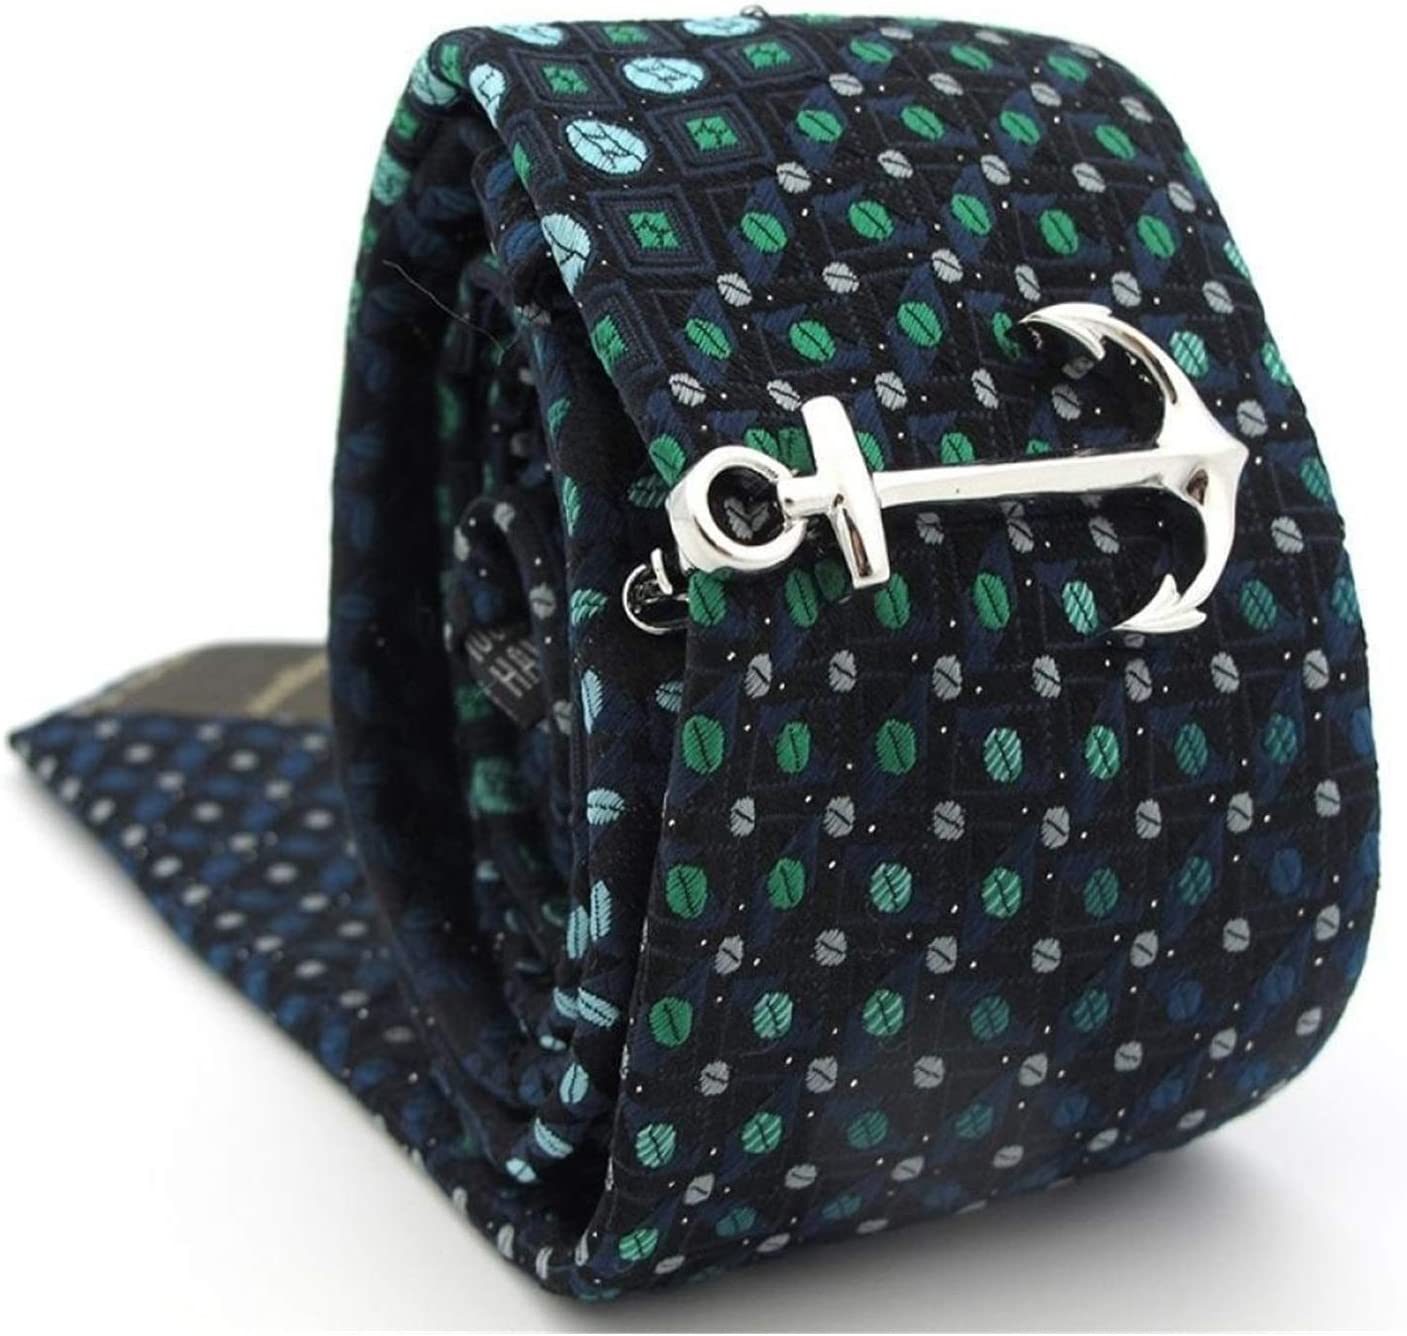 XIXINYA Men's Tie Clip Anchor Tie Clip Arrow Clip Men's Cufflinks Cufflinks Men's Gift Set Cufflinks Kit Cufflinks (Color : D)